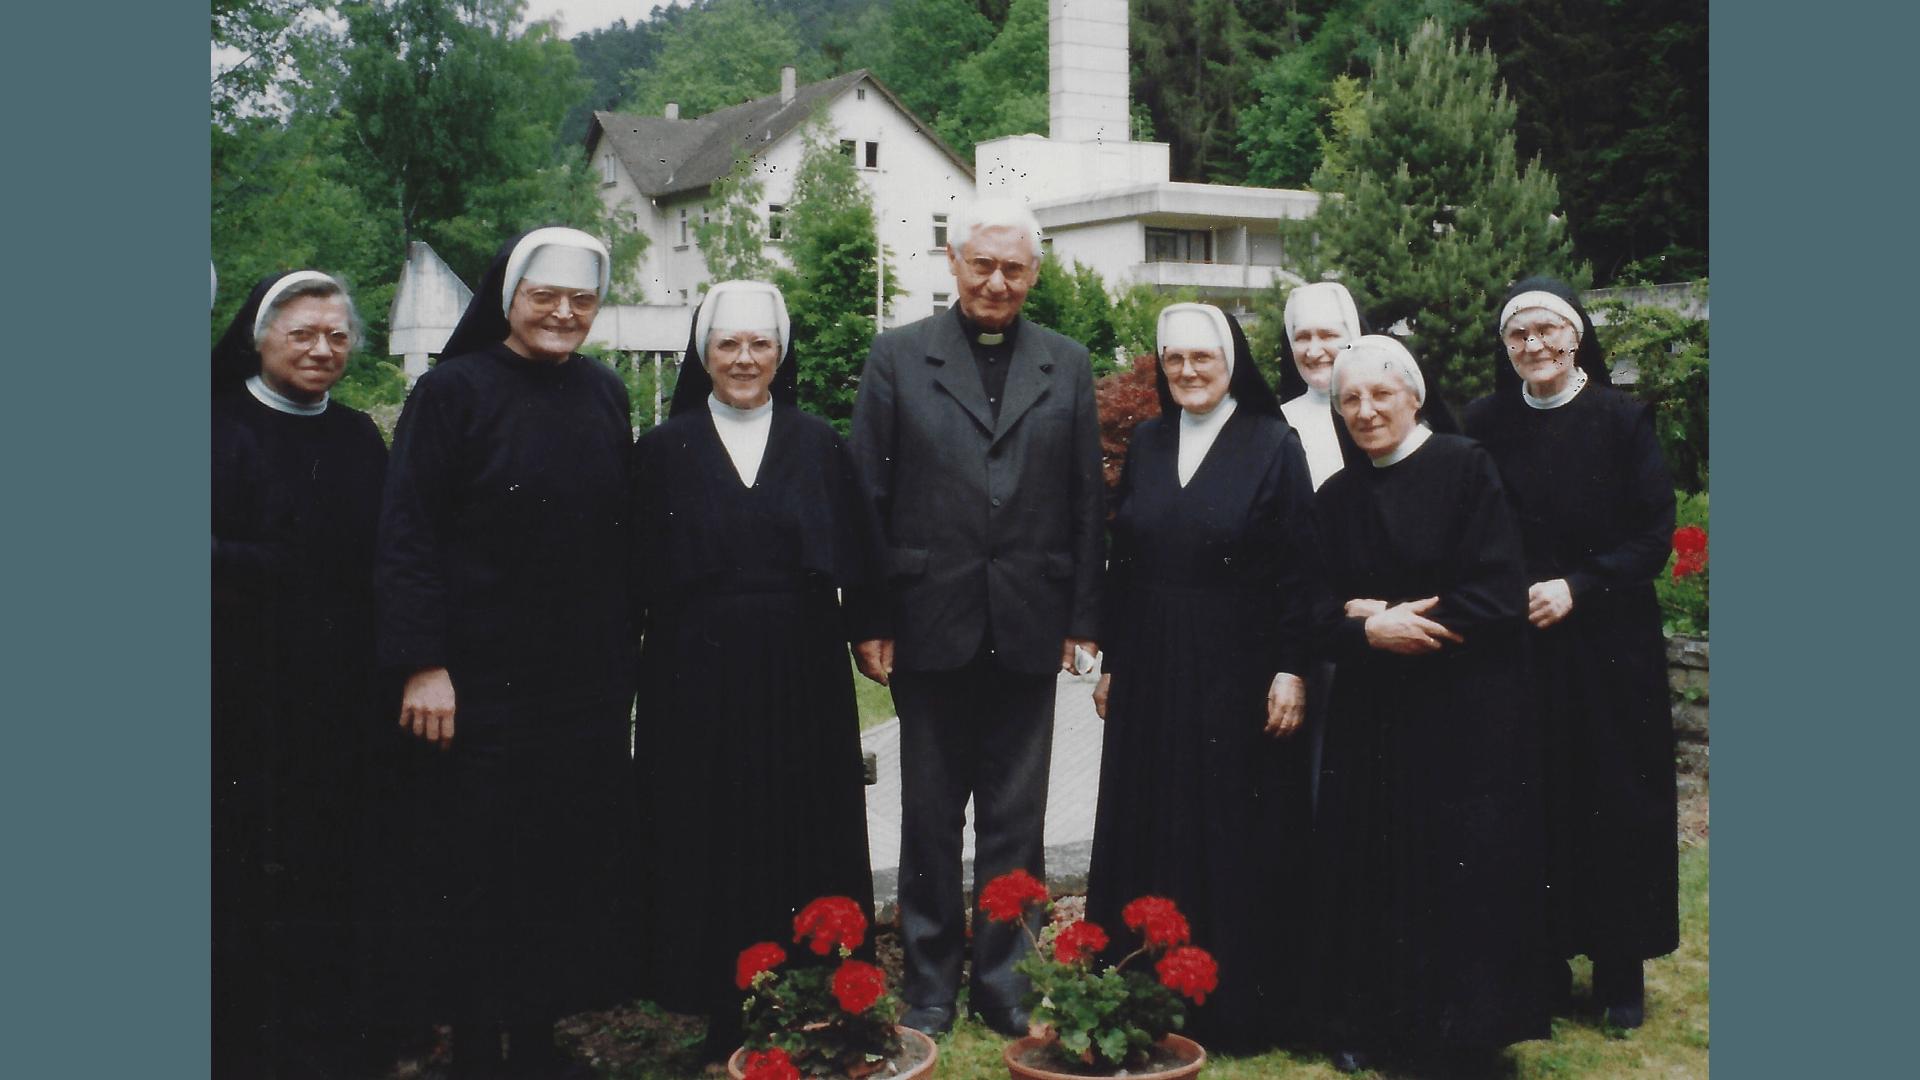 Pater Gruber - 40. Jahre Priester - 1982- Feier in Bad Niedernau. Foto: Archiv Arme Schulschwestern